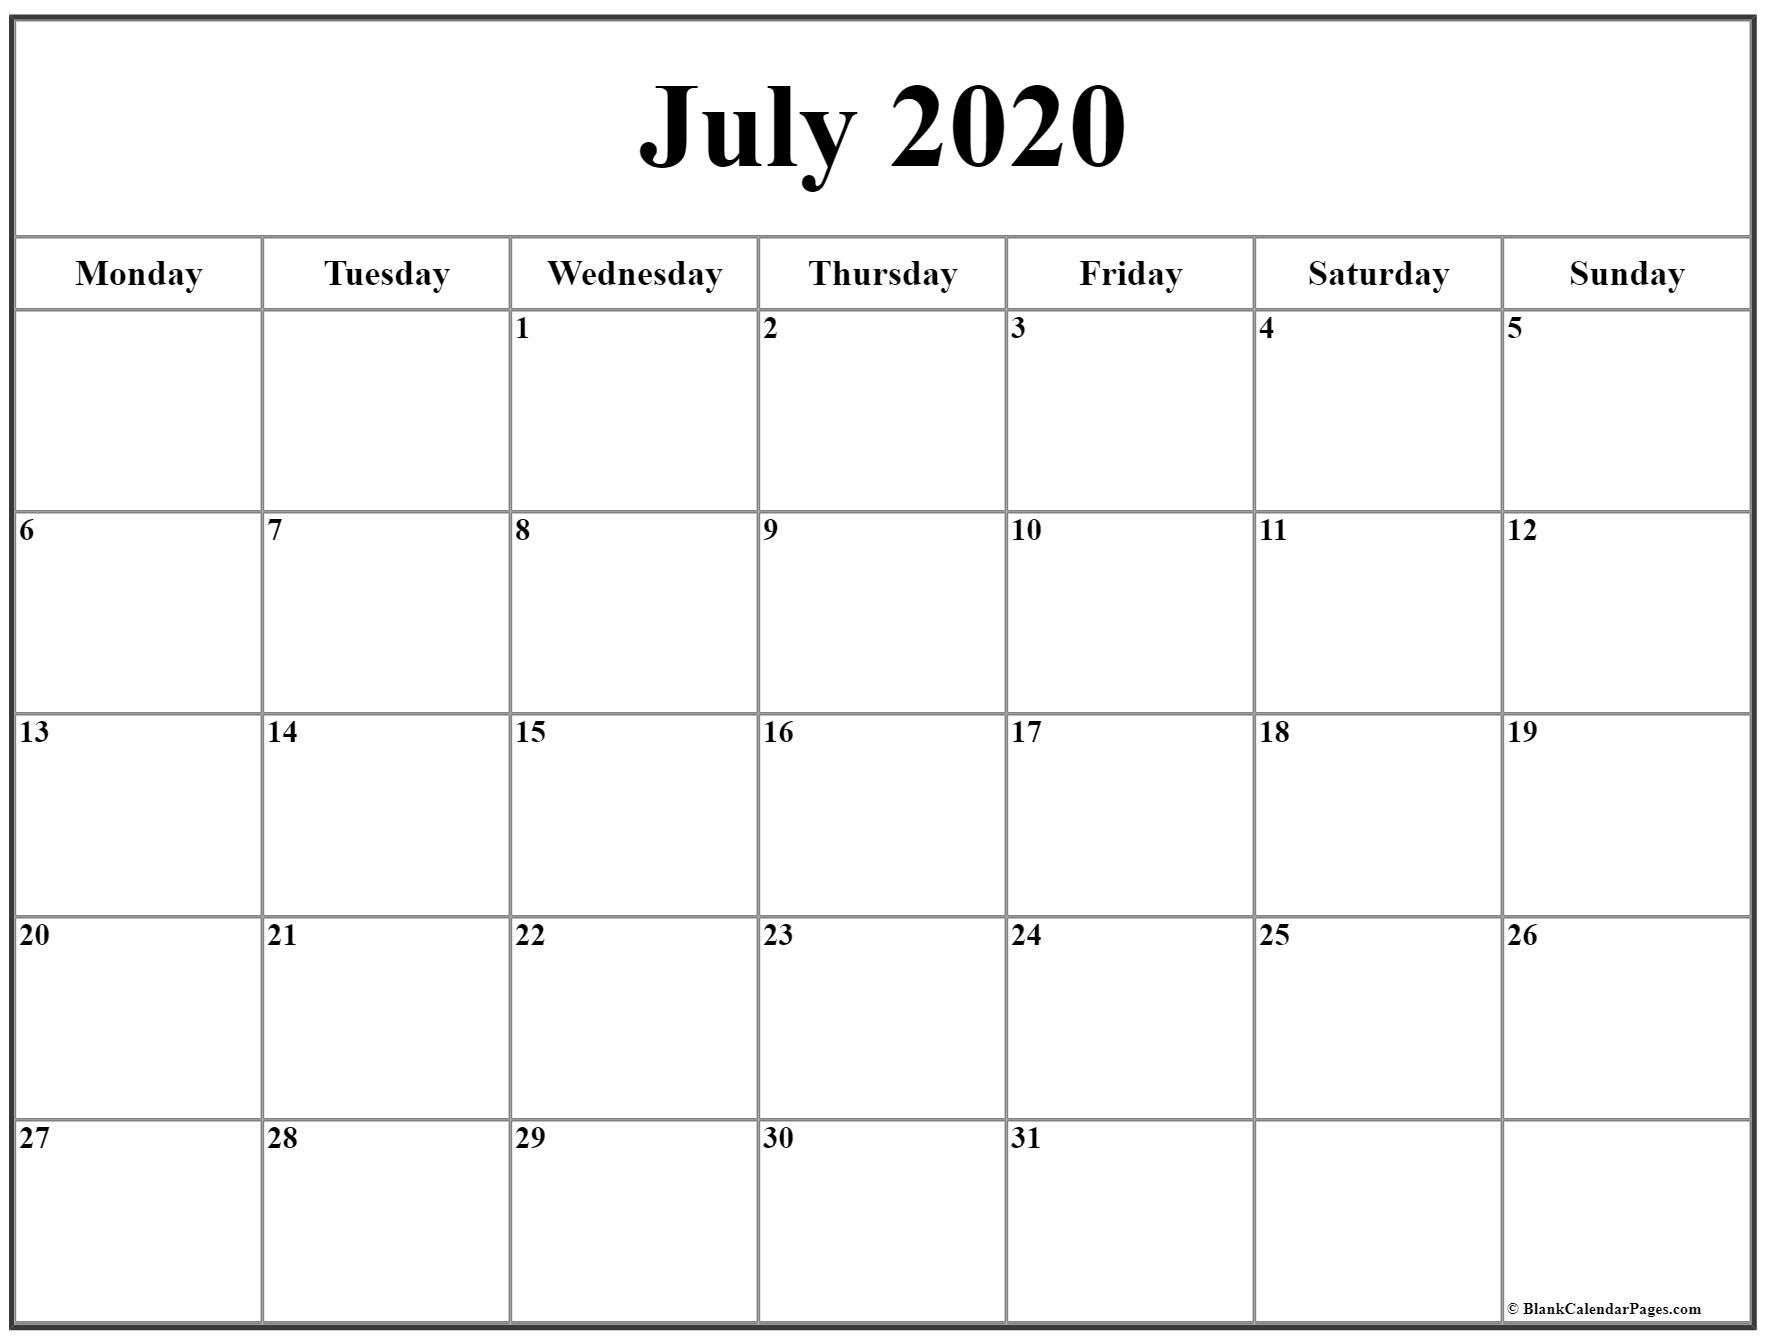 July 2020 Monday Calendar | Monday To Sunday with Sunday Thru Saturday Blank Calendar